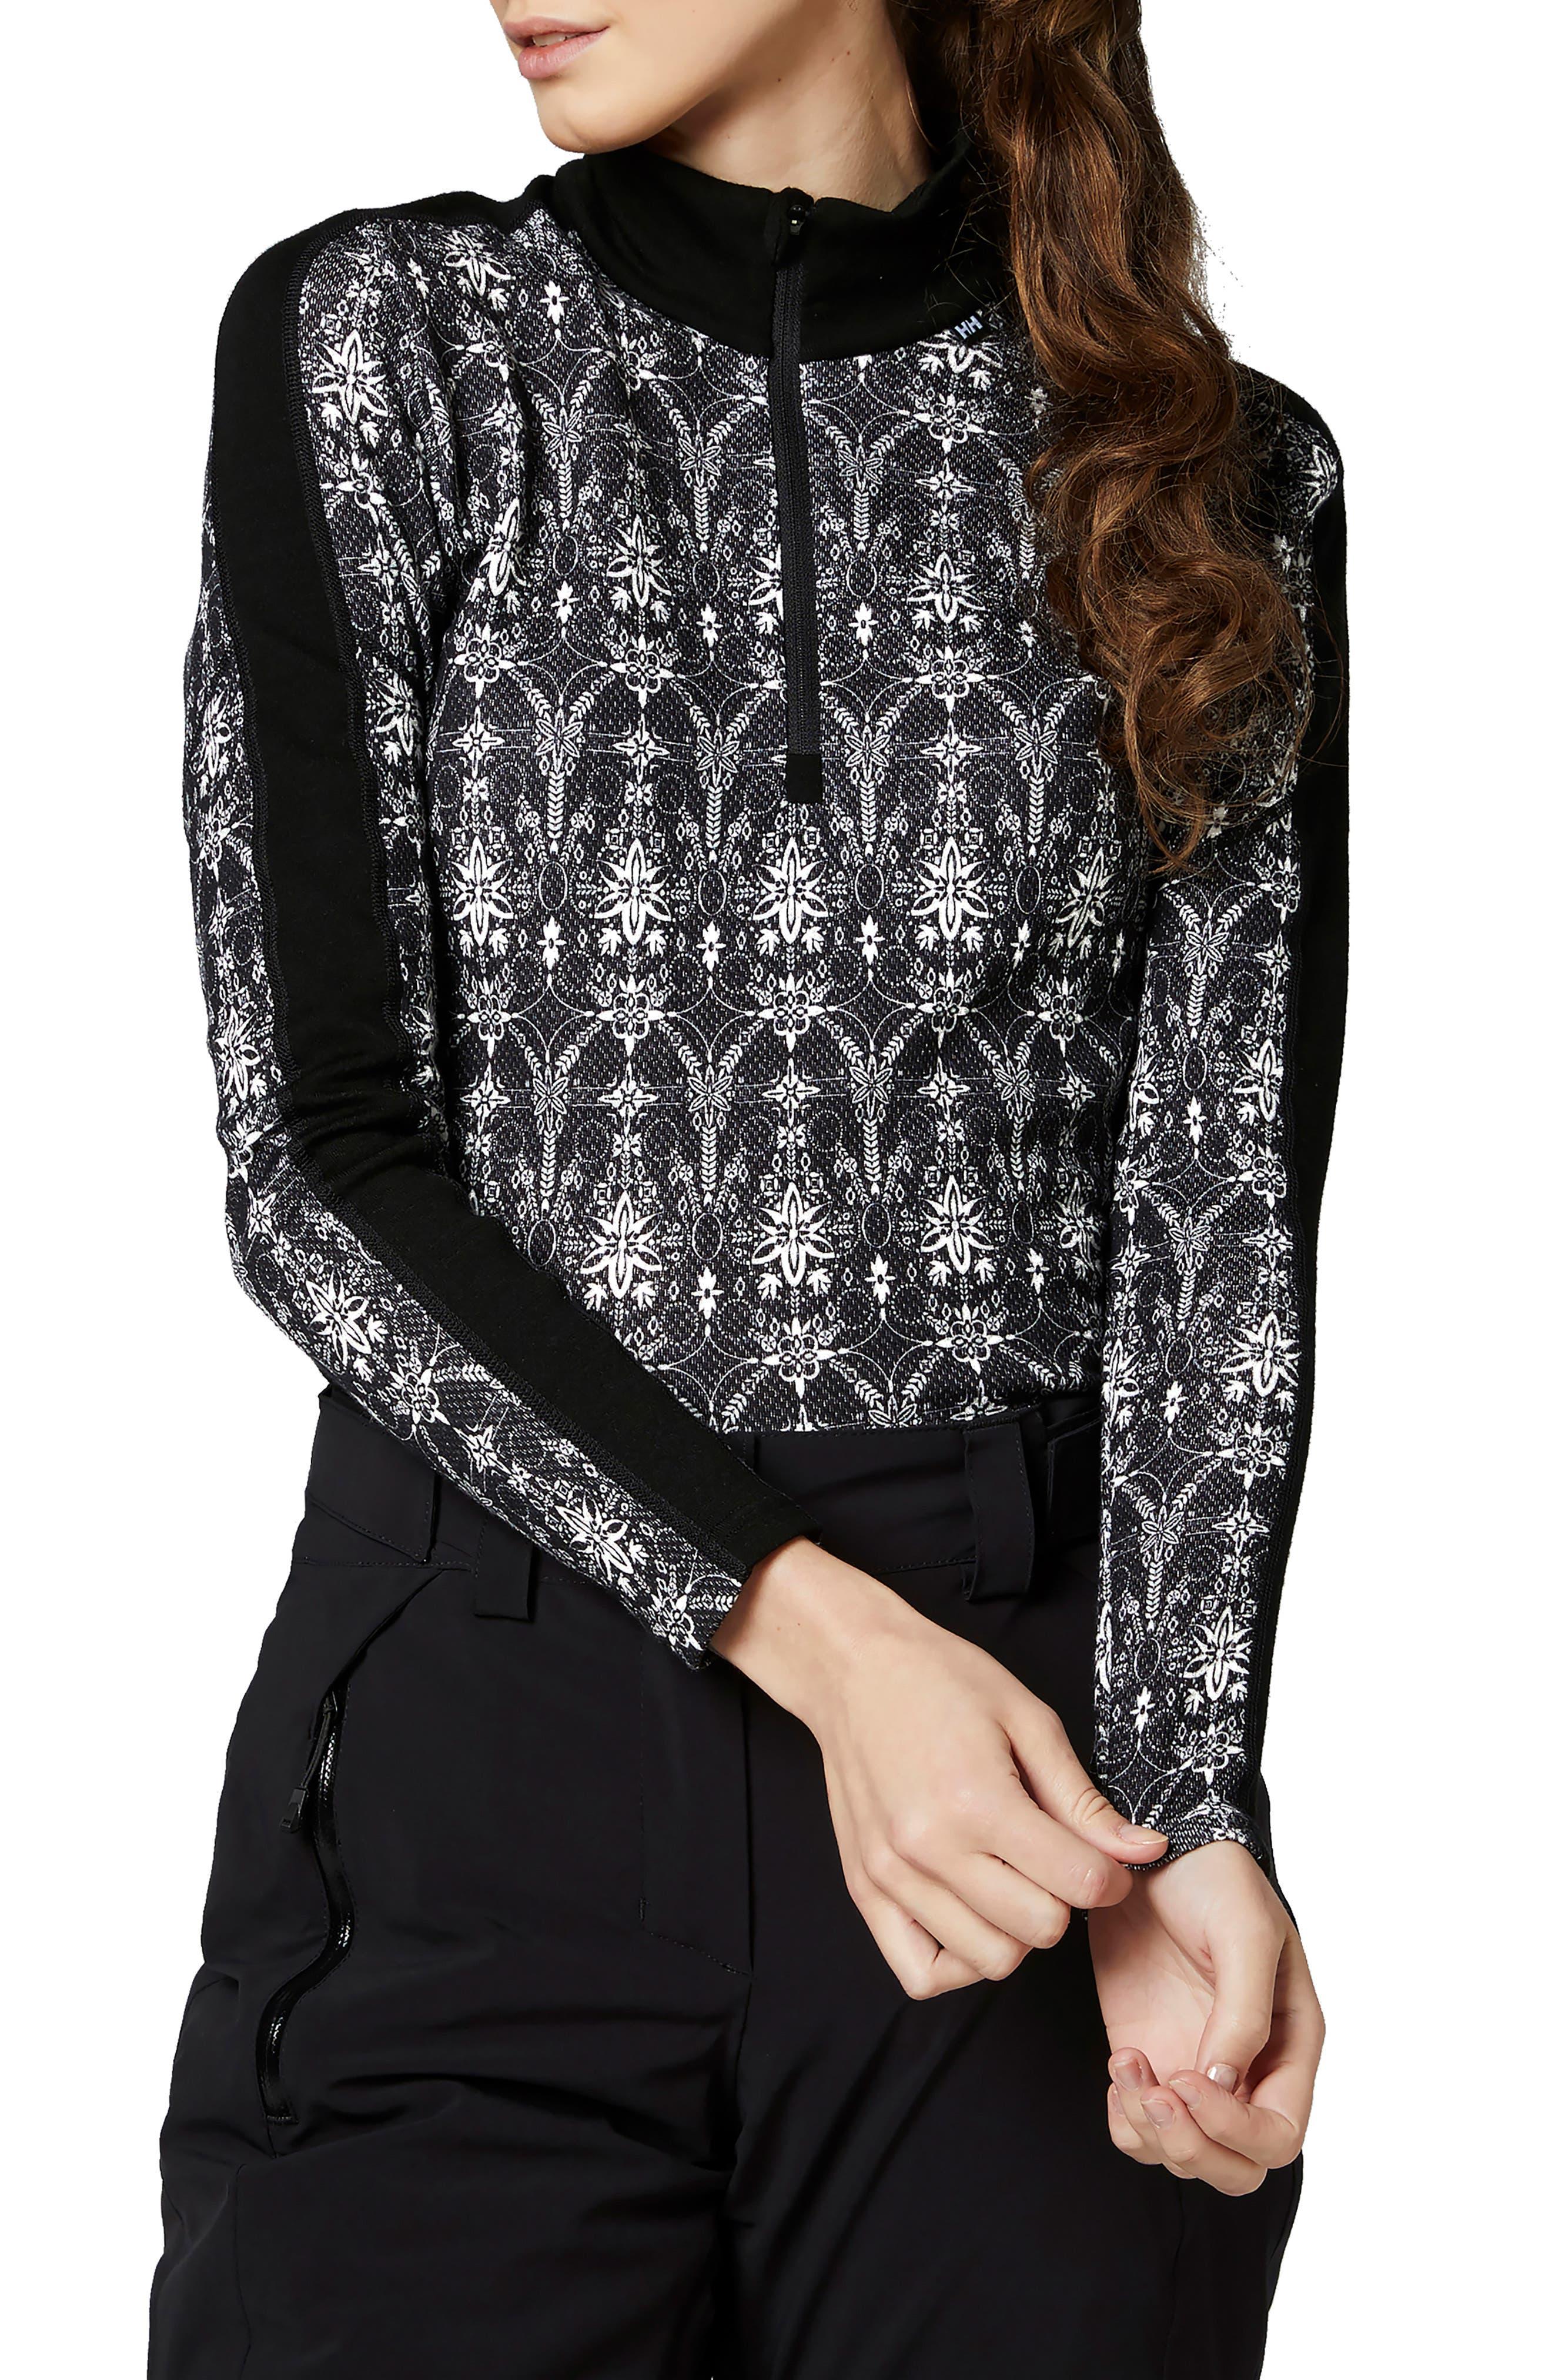 HELLY HANSEN Lifa Merino Wool Half Zip Pullover in Black/ Frost Print